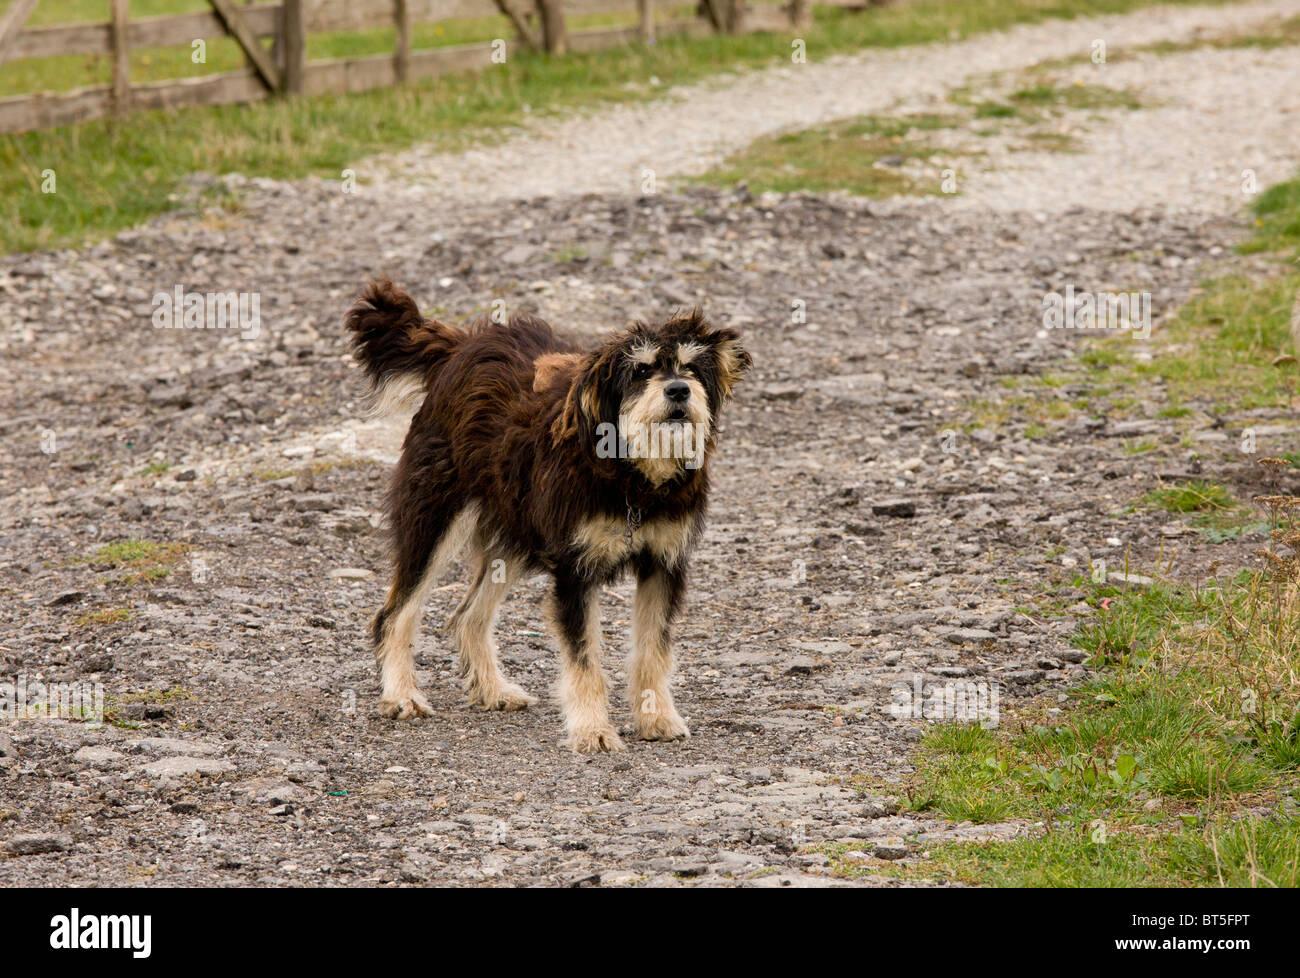 Sheep dog guarding sheep flock near saxon village of Soars, Transylvania; Romania - Stock Image